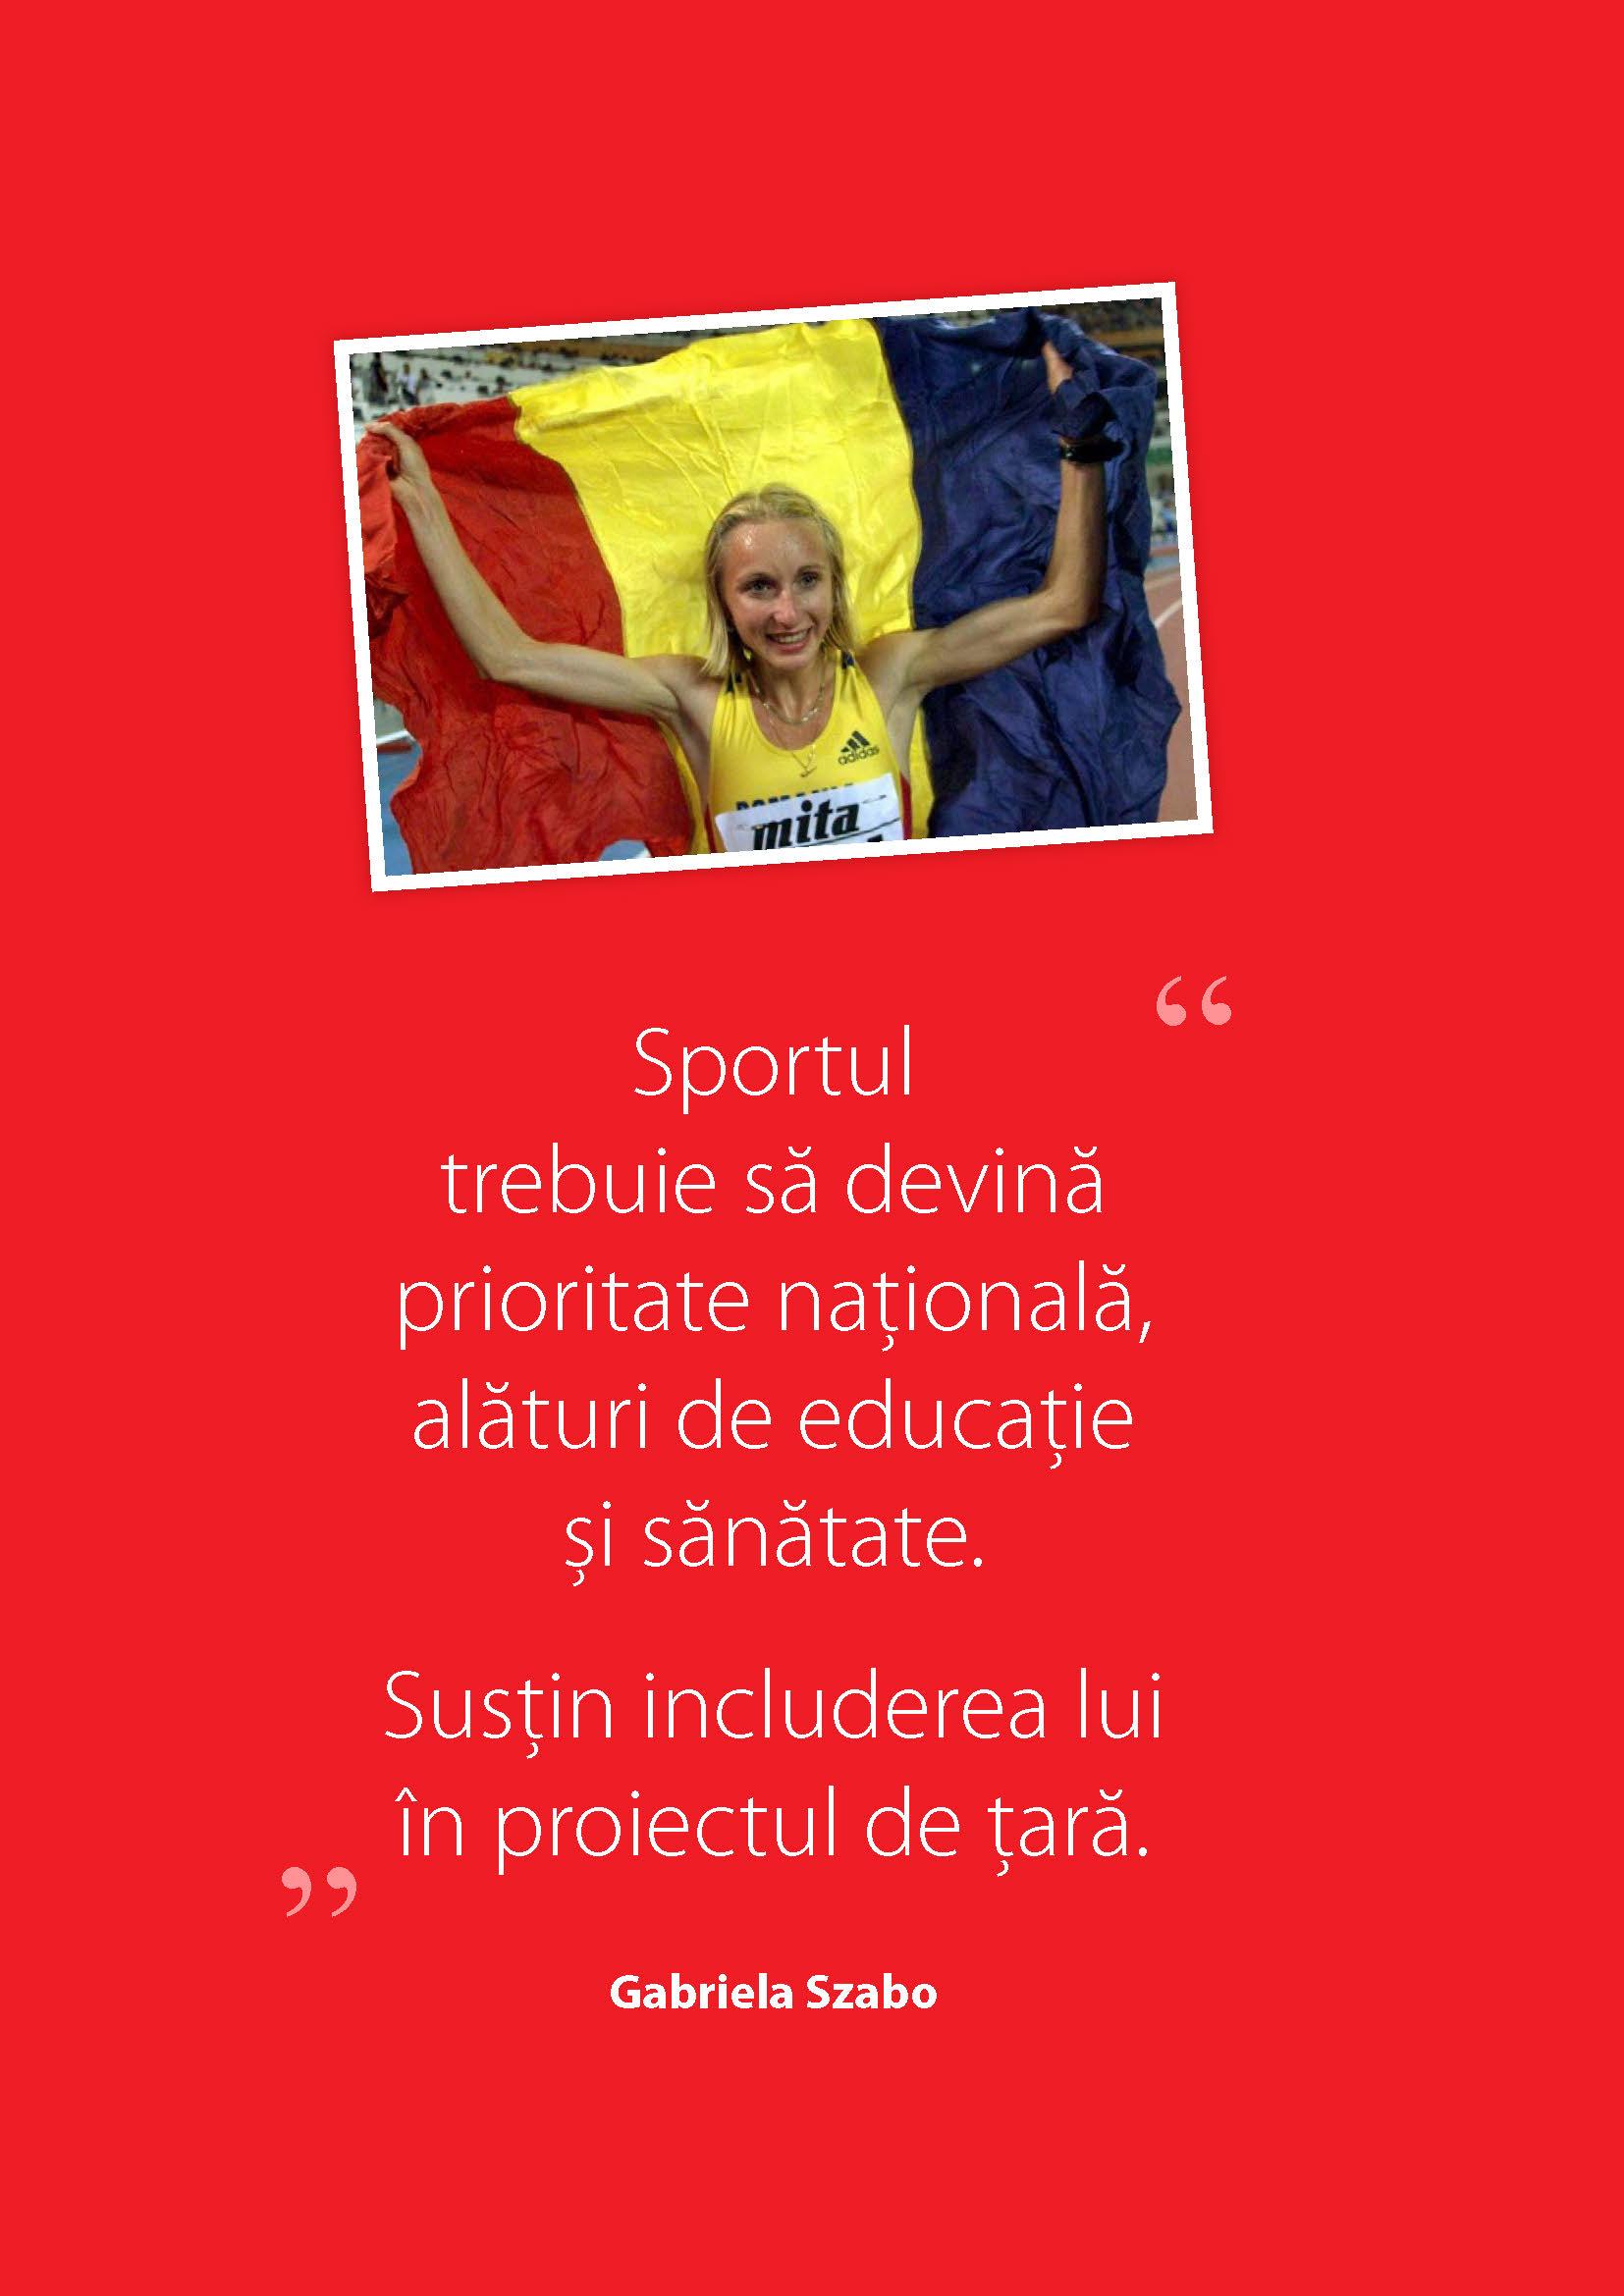 spv02_candidatura-cosr_1-6_pco_13oct16_page_04